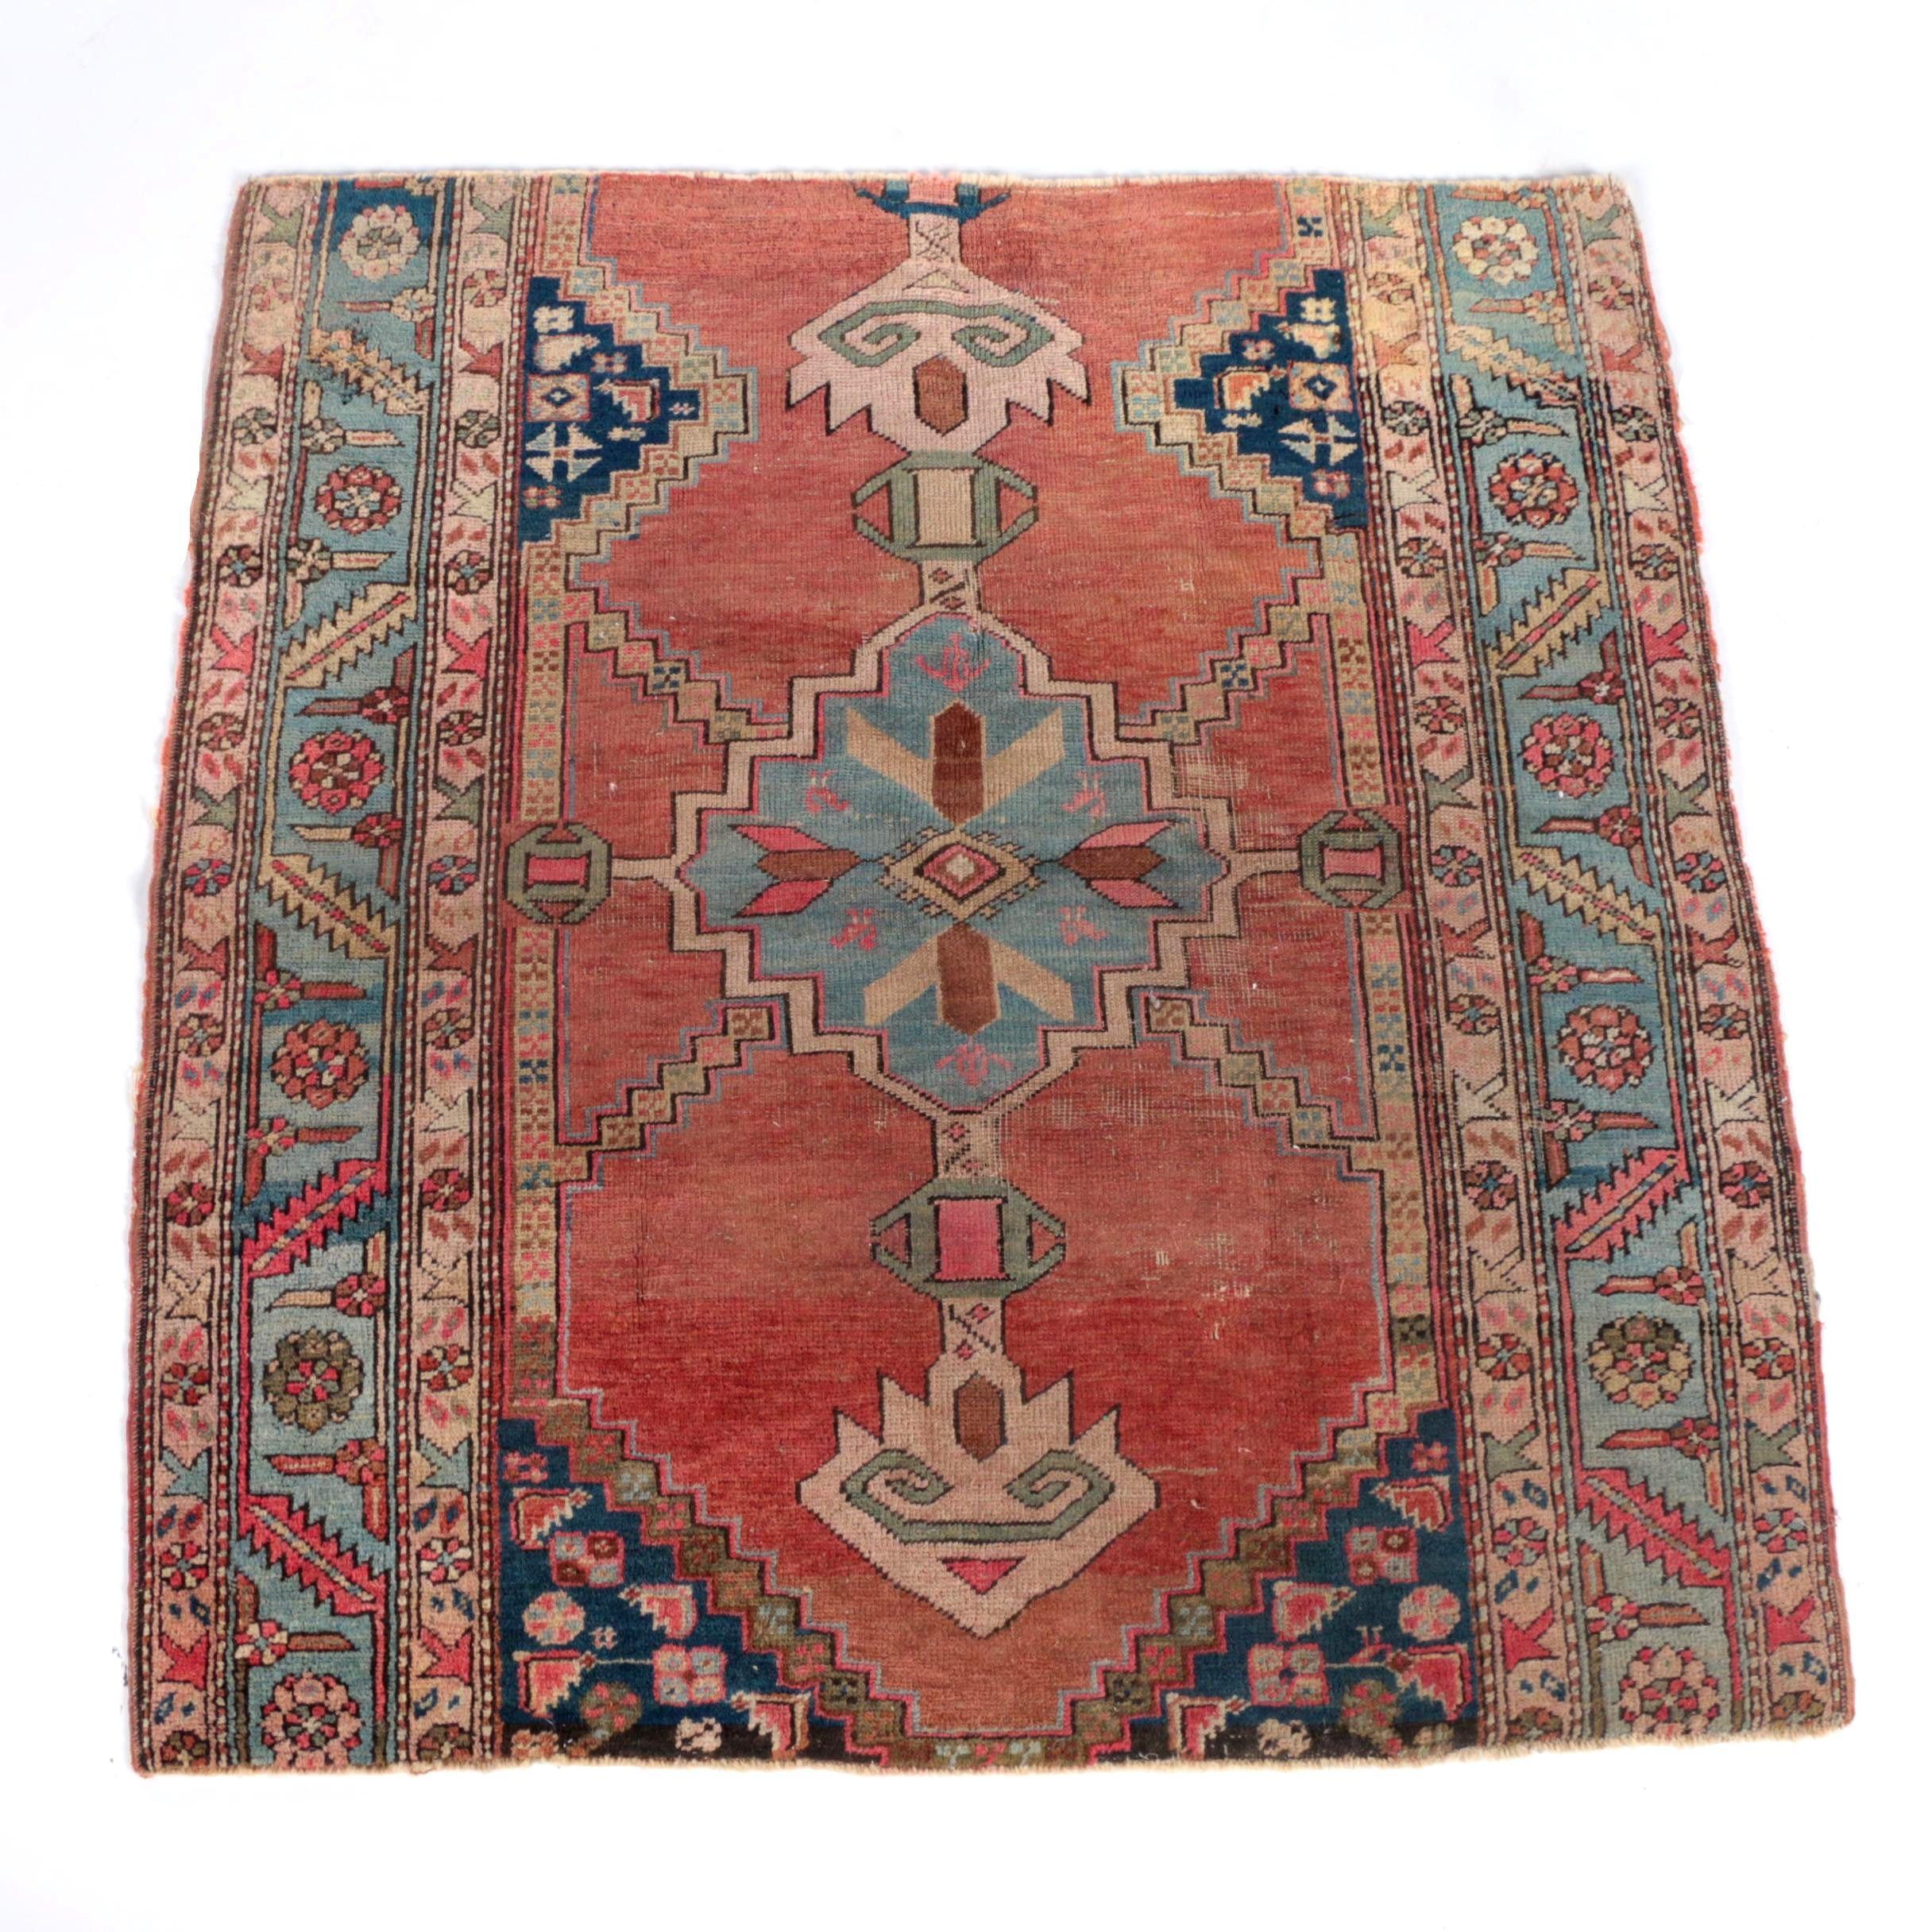 Vintage Hand-Knotted Kazak Wool Area Rug Remnant